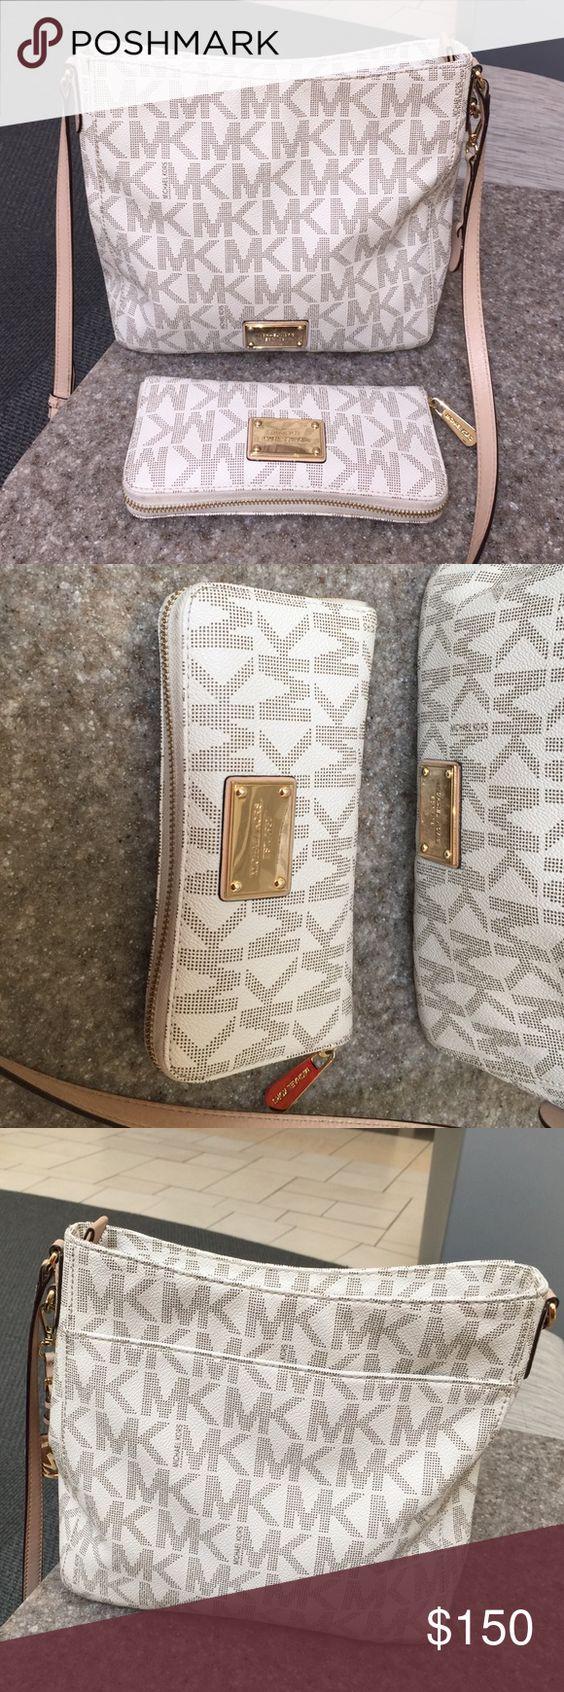 Michael Kors Crossbody Purse & Wallet Gently used MK purse and wallet. Michael Kors Bags Crossbody Bags